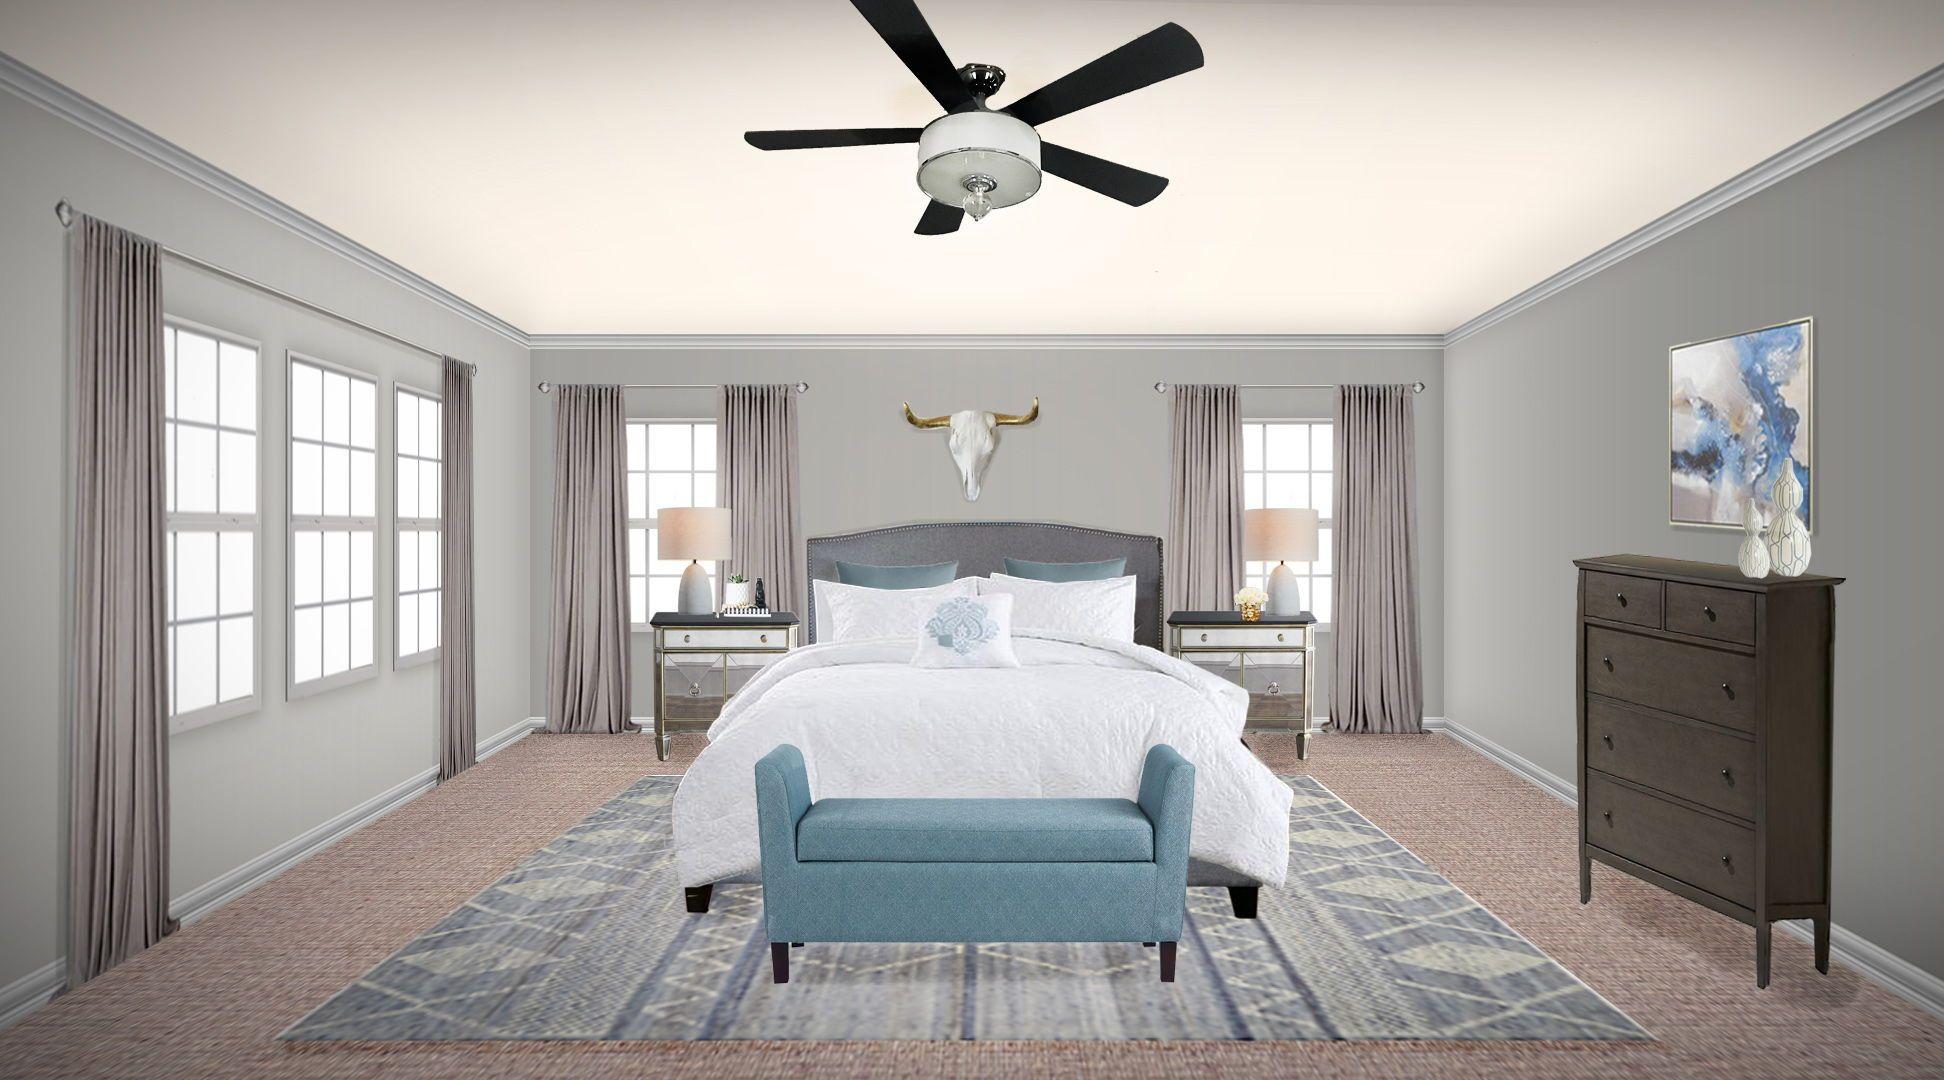 Blue And Grey Modern Traditional Master Bedroom Design Master Bedroom Design Blue Bedroom Decor Modern Bedroom Design